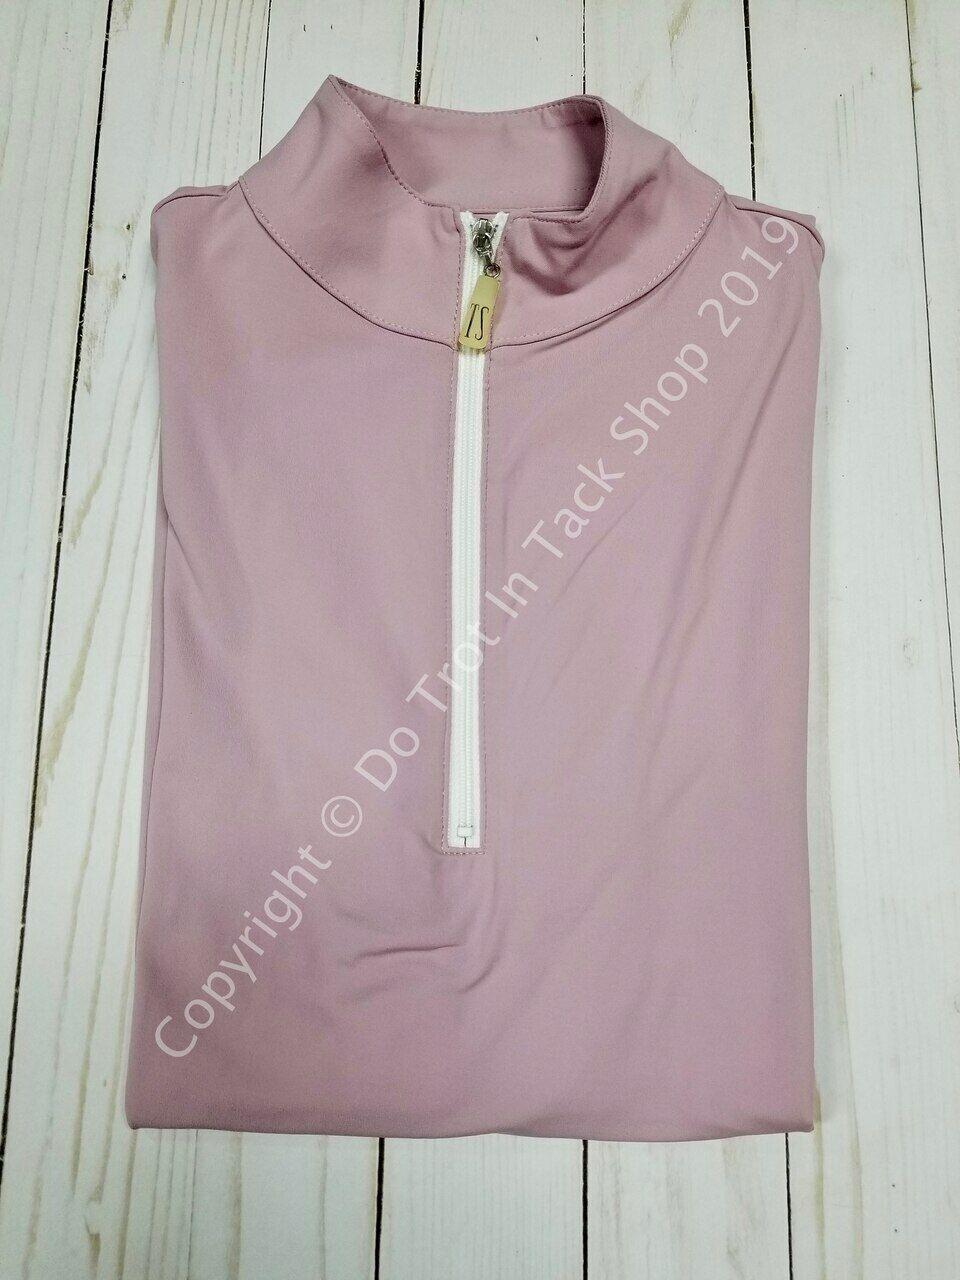 TailGoldt Sportsman ICEFIL Ziptop Sleeveless Shirt - Wisteria Weiß